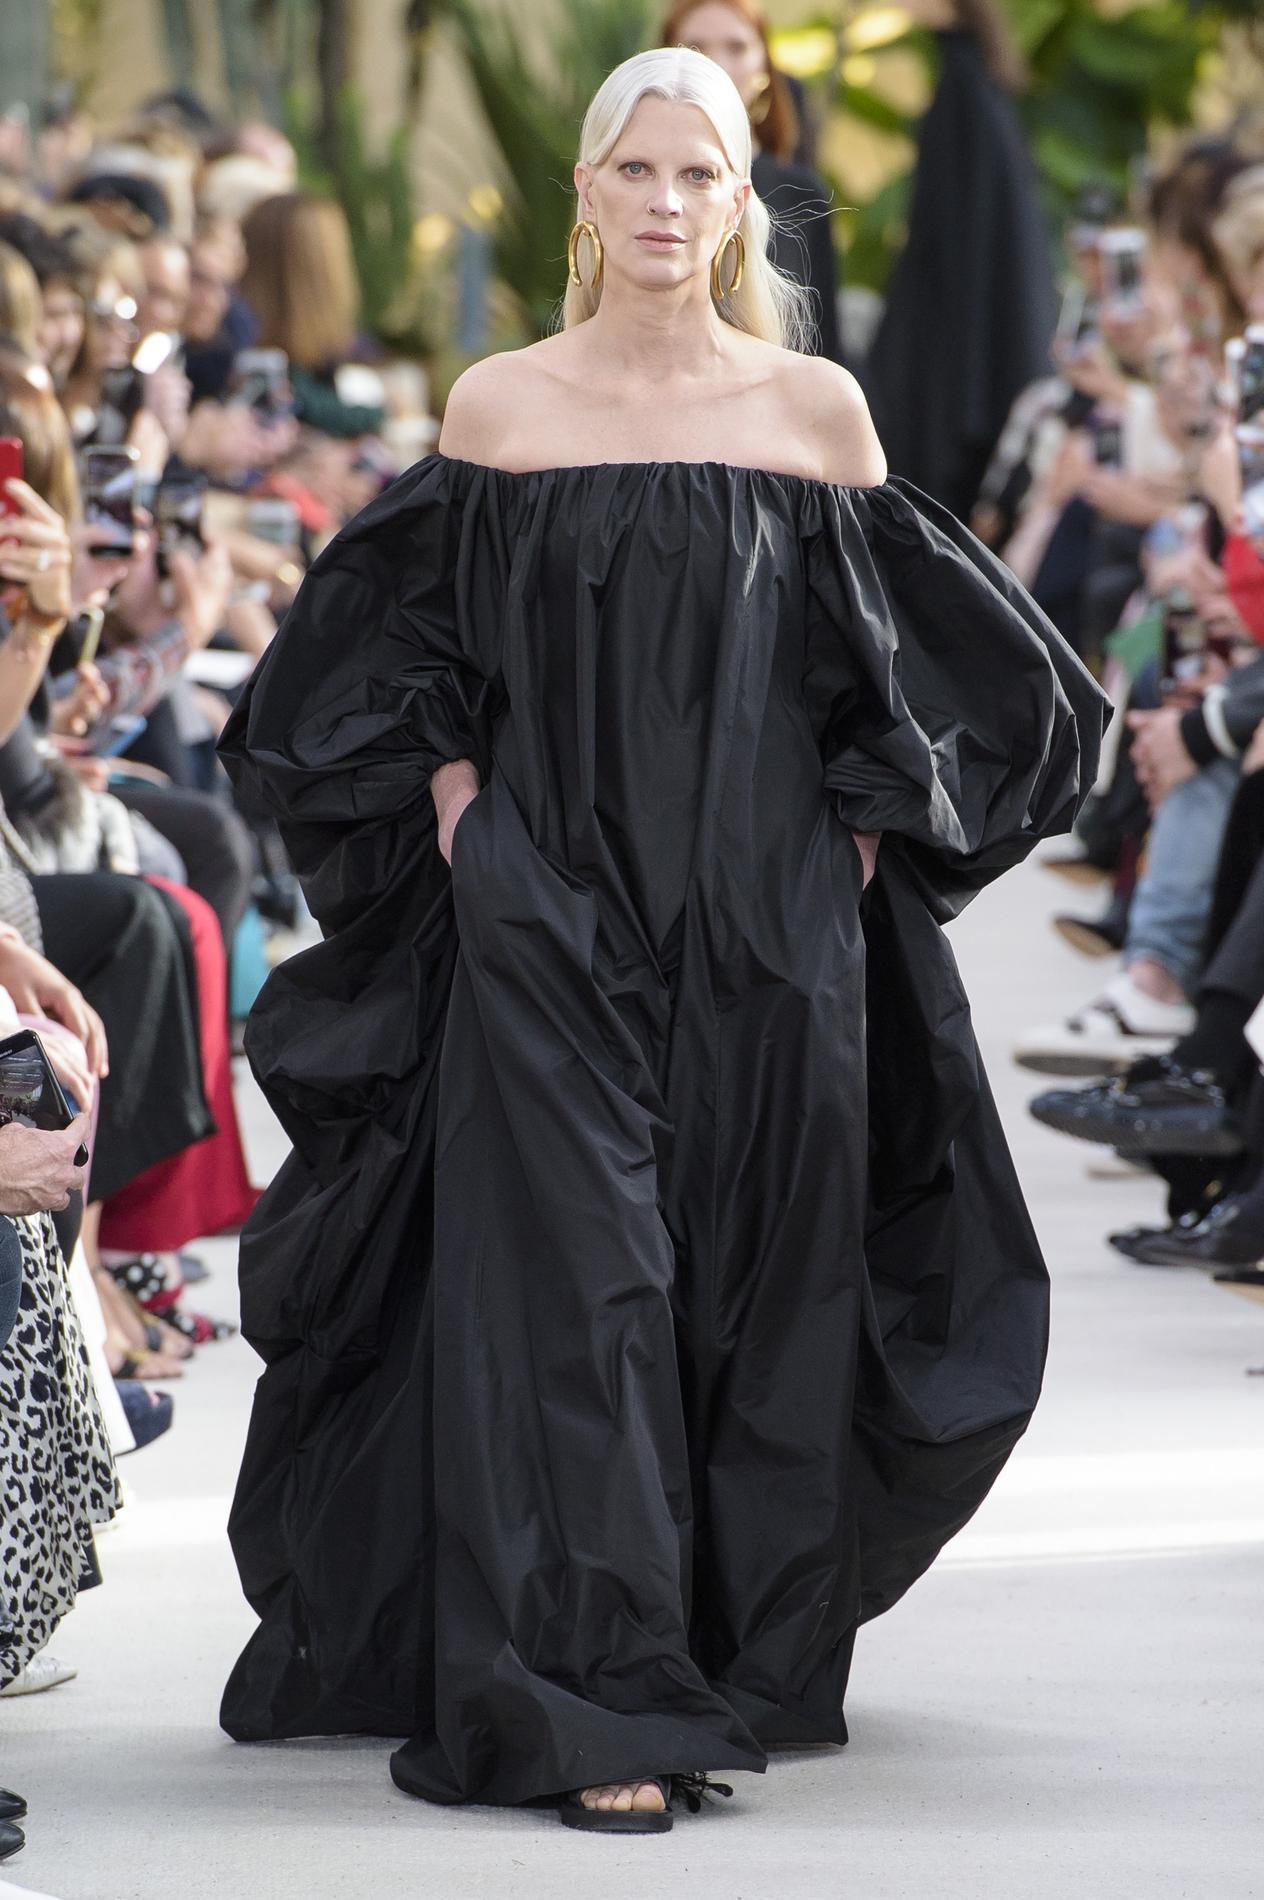 Madame Intenses Valentino Et Au Couleurs Figaro Majeure Défilé Poésie m0yvNOnw8